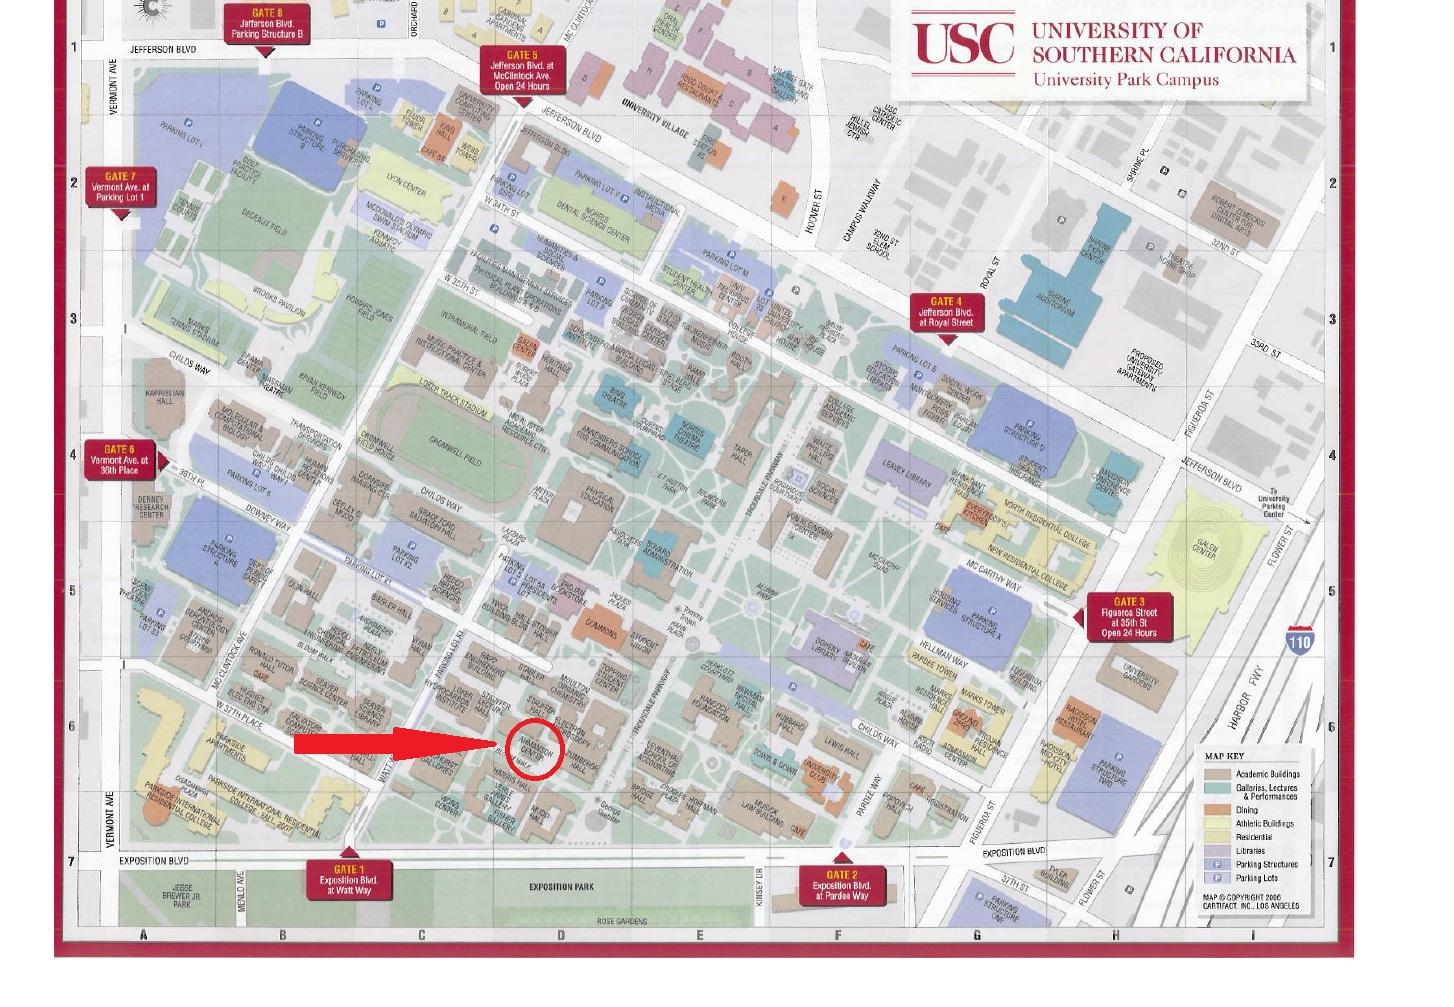 Ncat Campus Map Of Acb – Wonderful Image Gallery